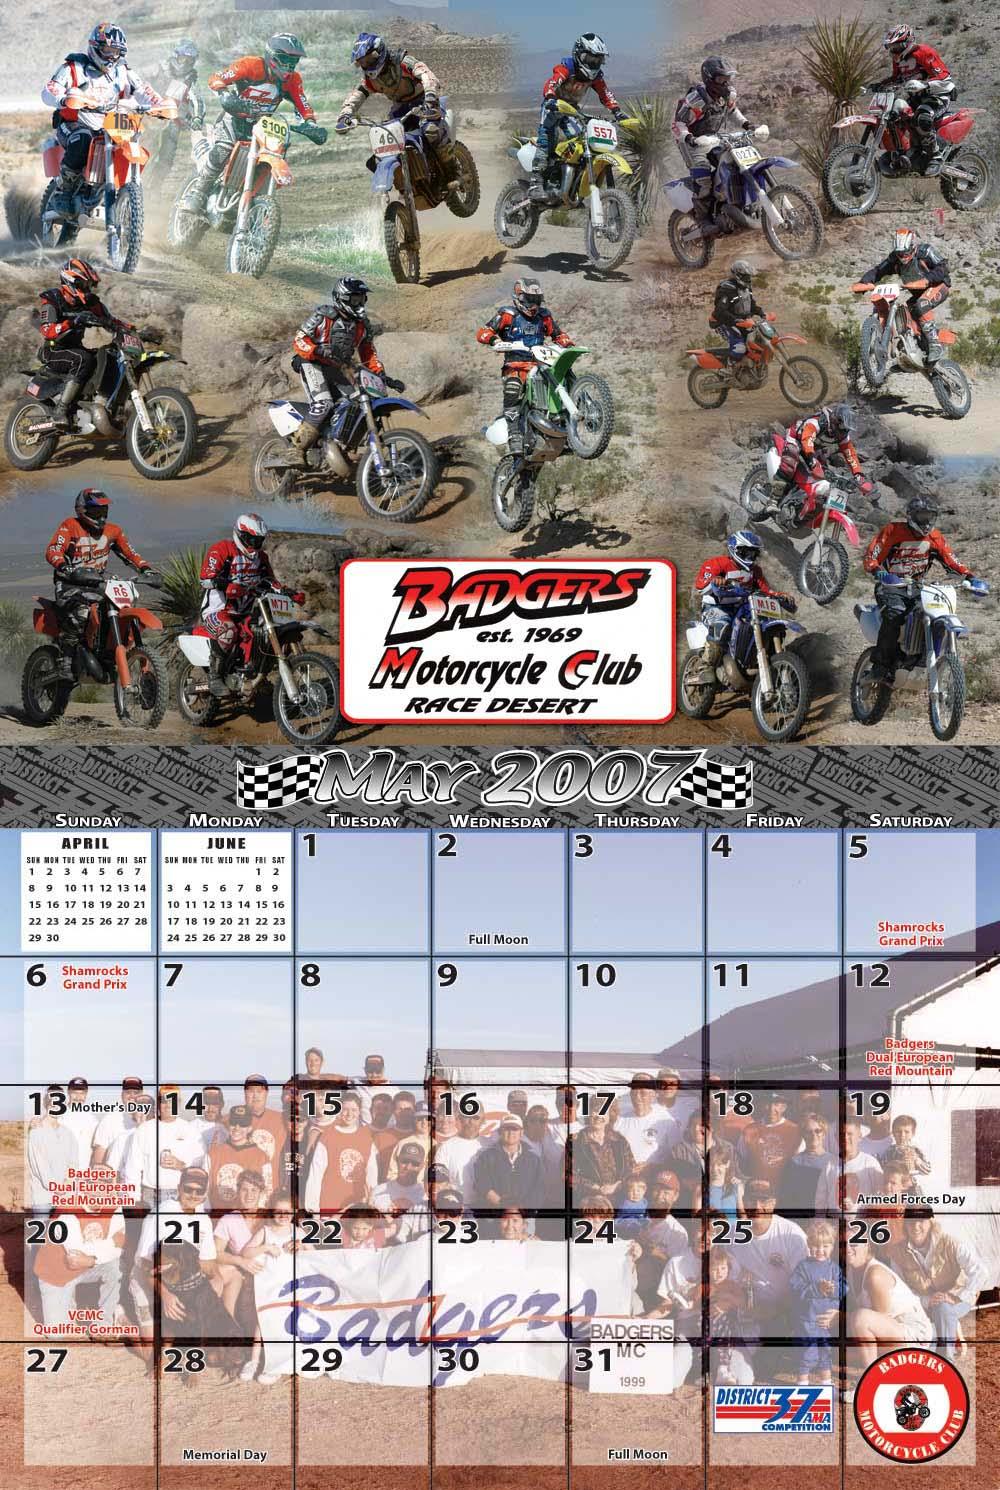 Racing Calendar May : Animal house designs presents the off road racing